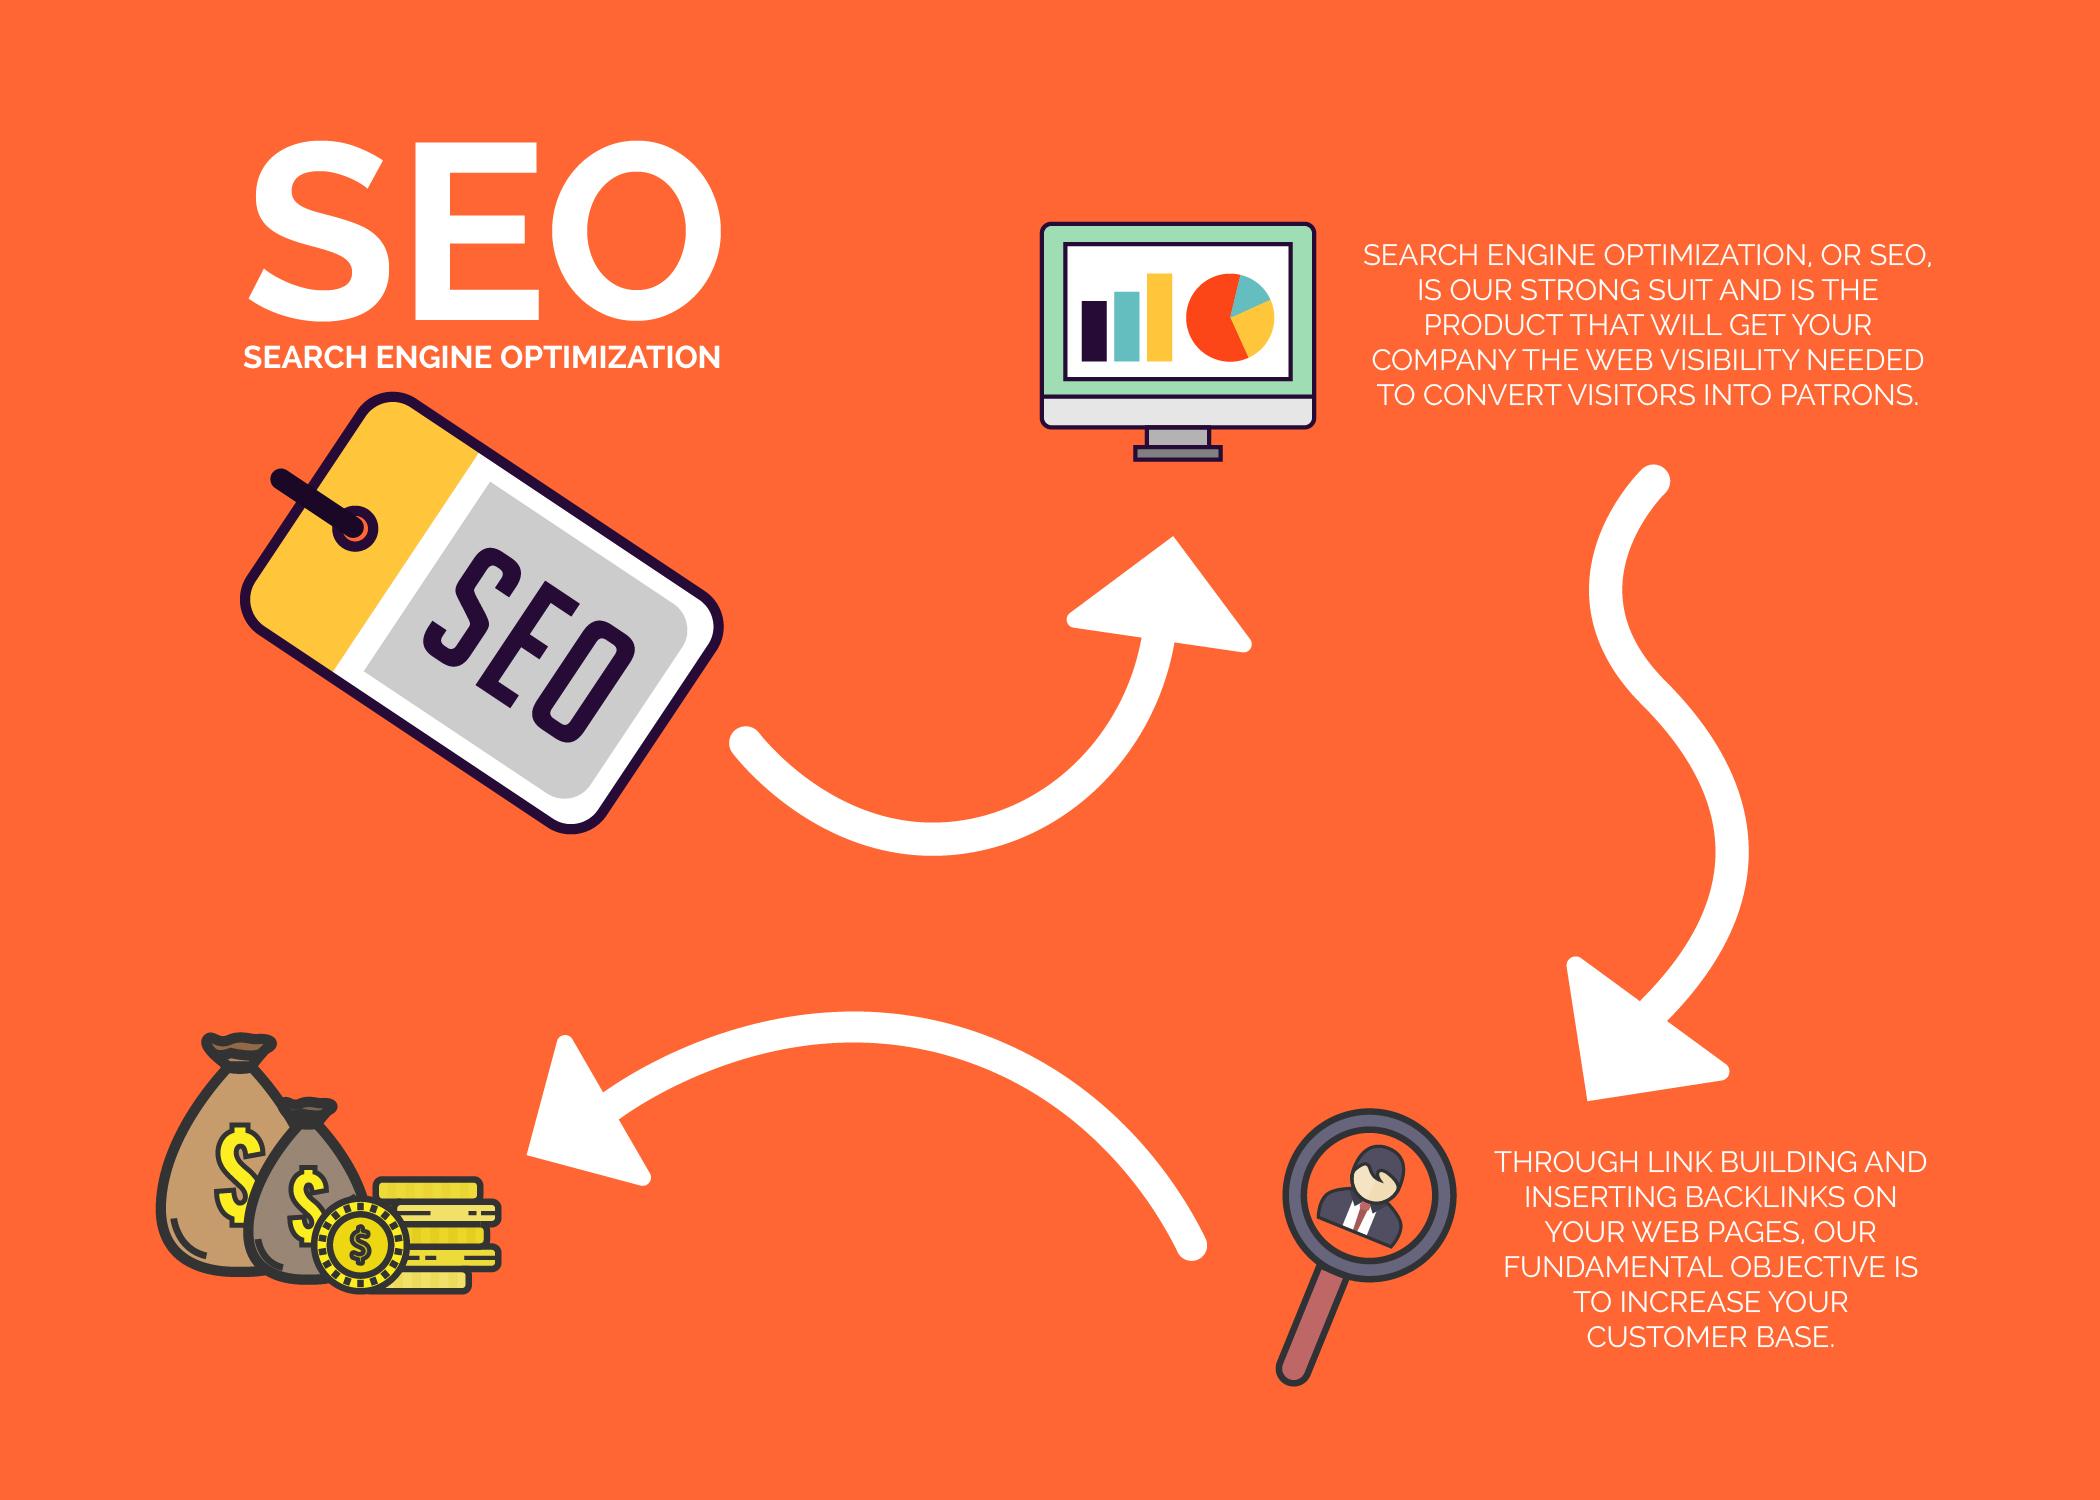 SEO Infographic KinexMedia